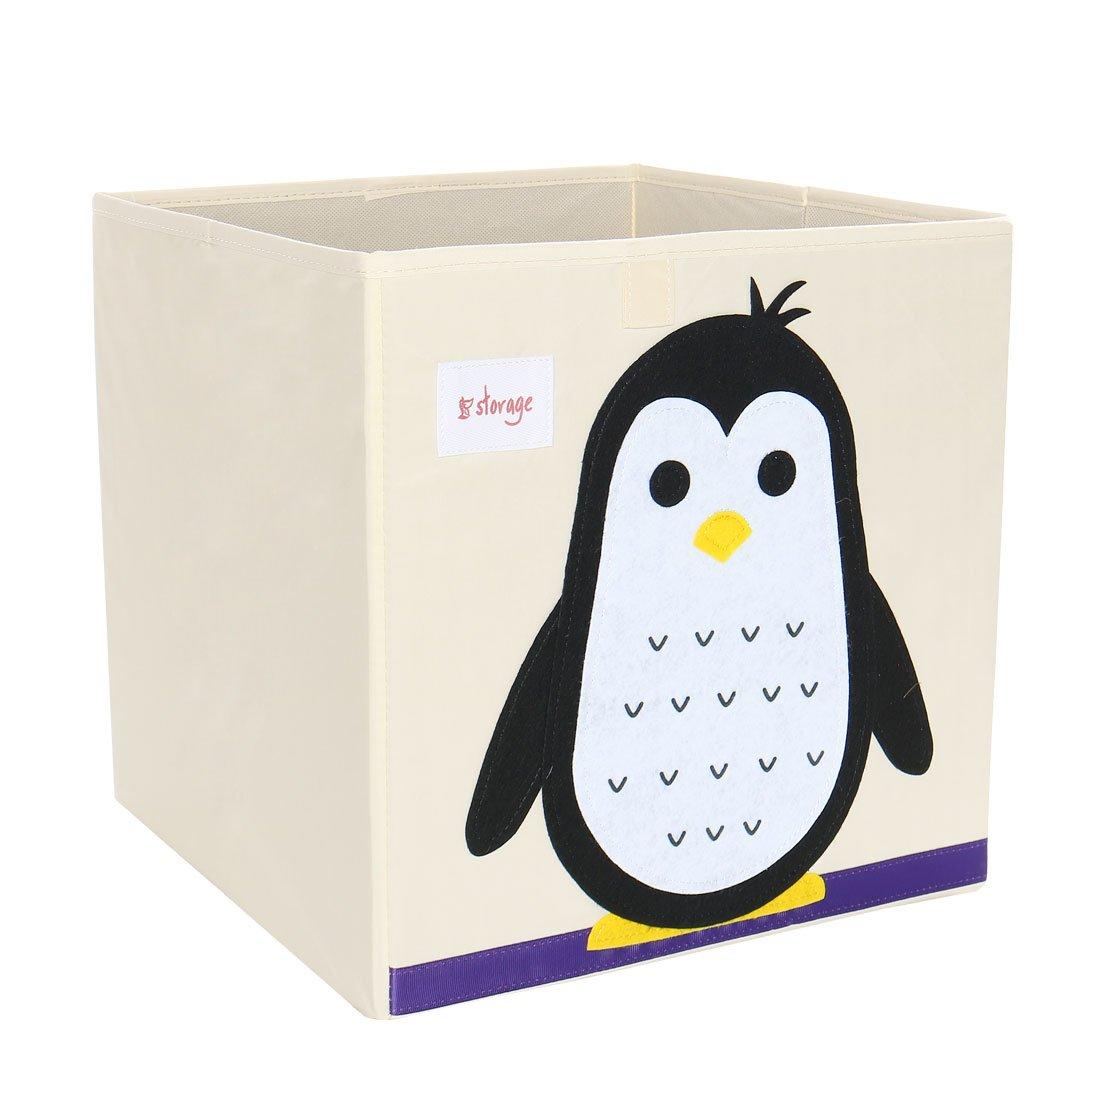 PiccoCasa Foldable Toy Storage Bins Square Cartoon Animal Nonwovens Storage Box Eco-Friendly Fabric Storage Cubes Organizer for Bedroom Playroom Penguin No Lid 13''x13''x13''